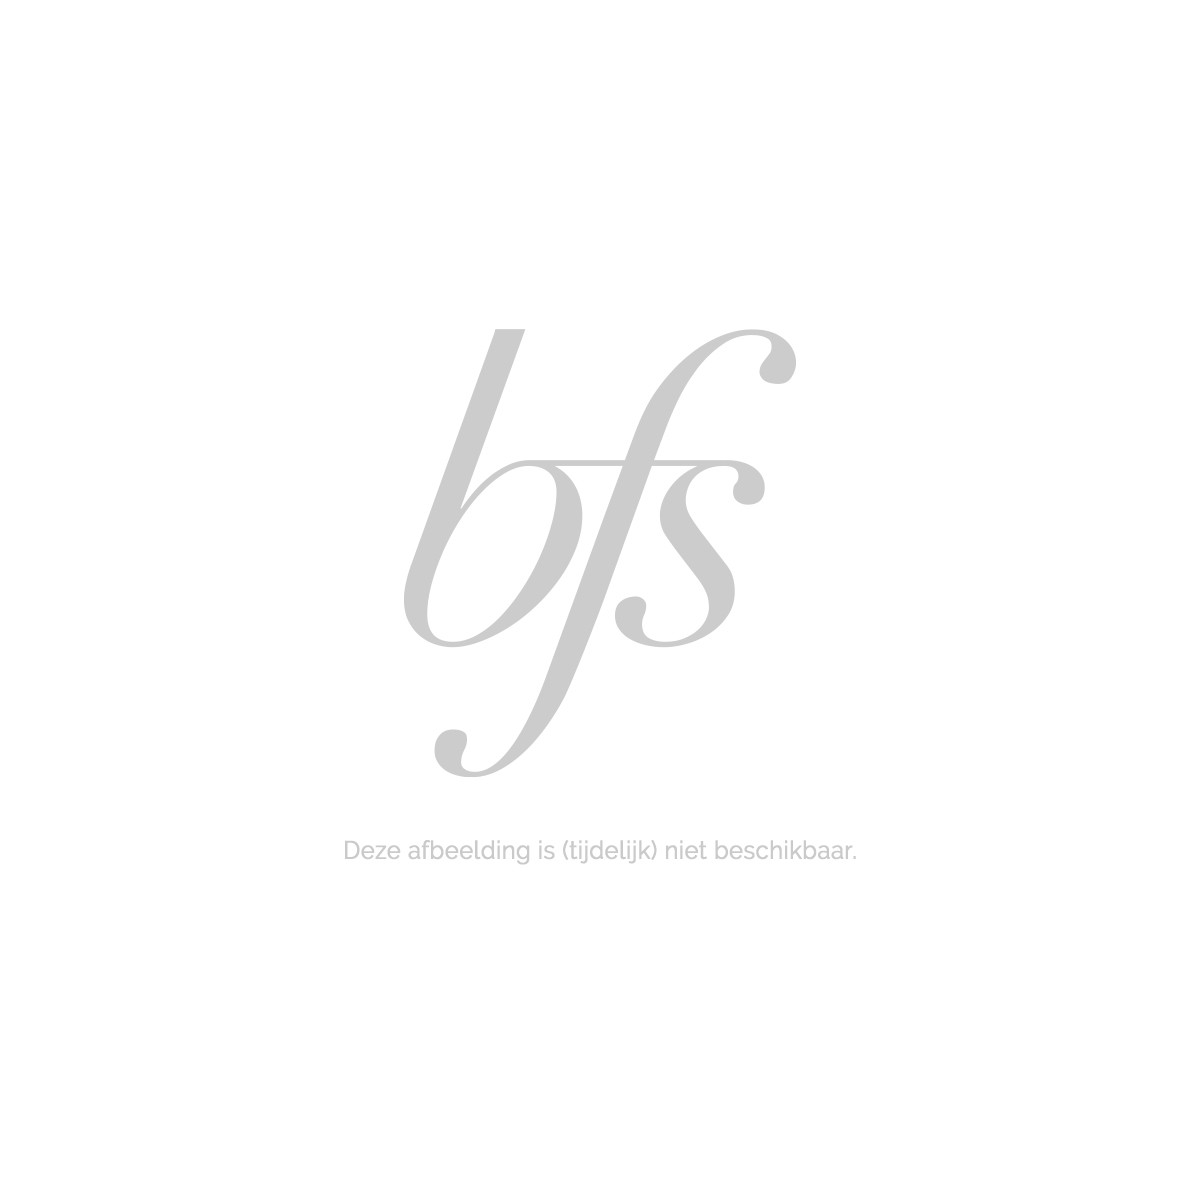 Helena Rubinstein Lash Queen Mascara Feline Extravaganza 7,20 Ml